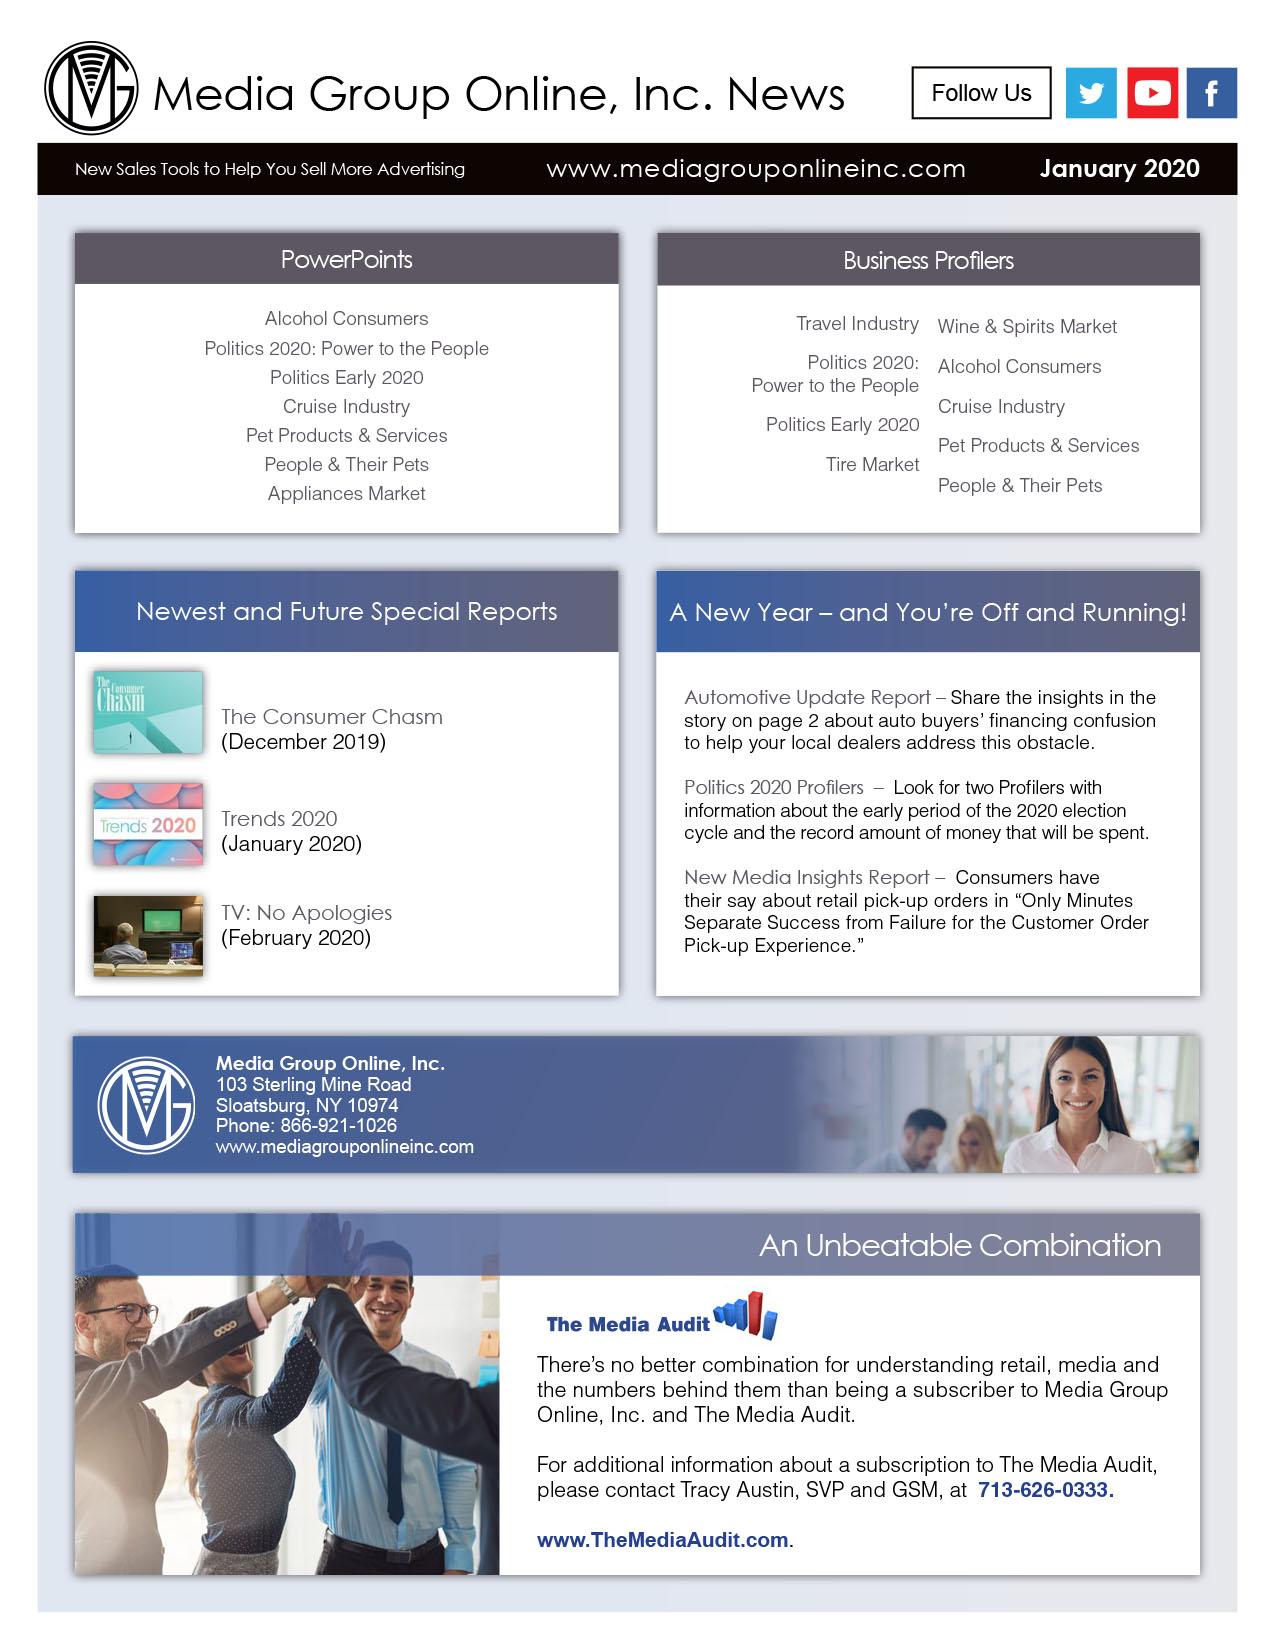 January 2020 Newsletter 8.5x11 PDF